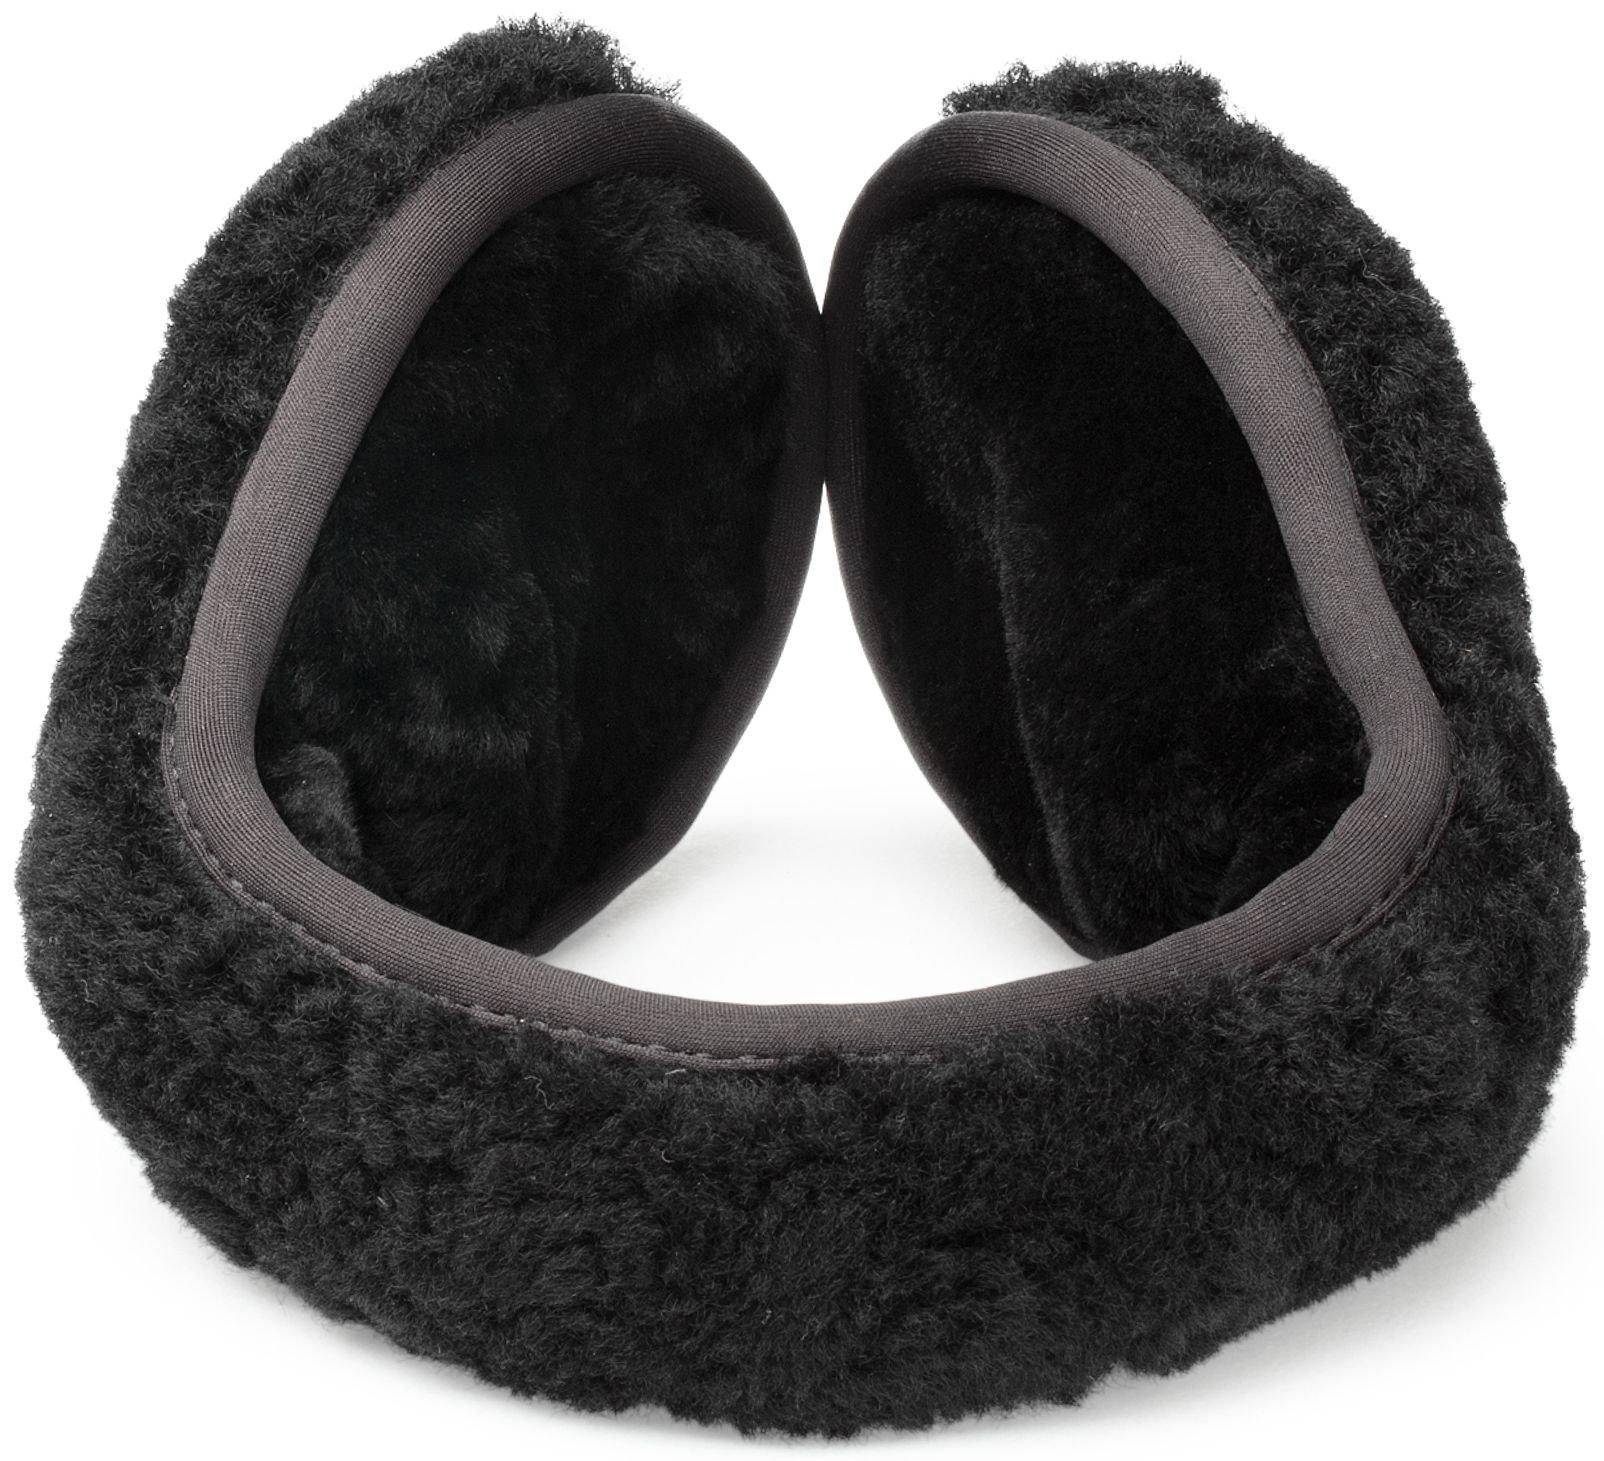 UGG Womens Curly Wrap Around Earmuff in Black Curly